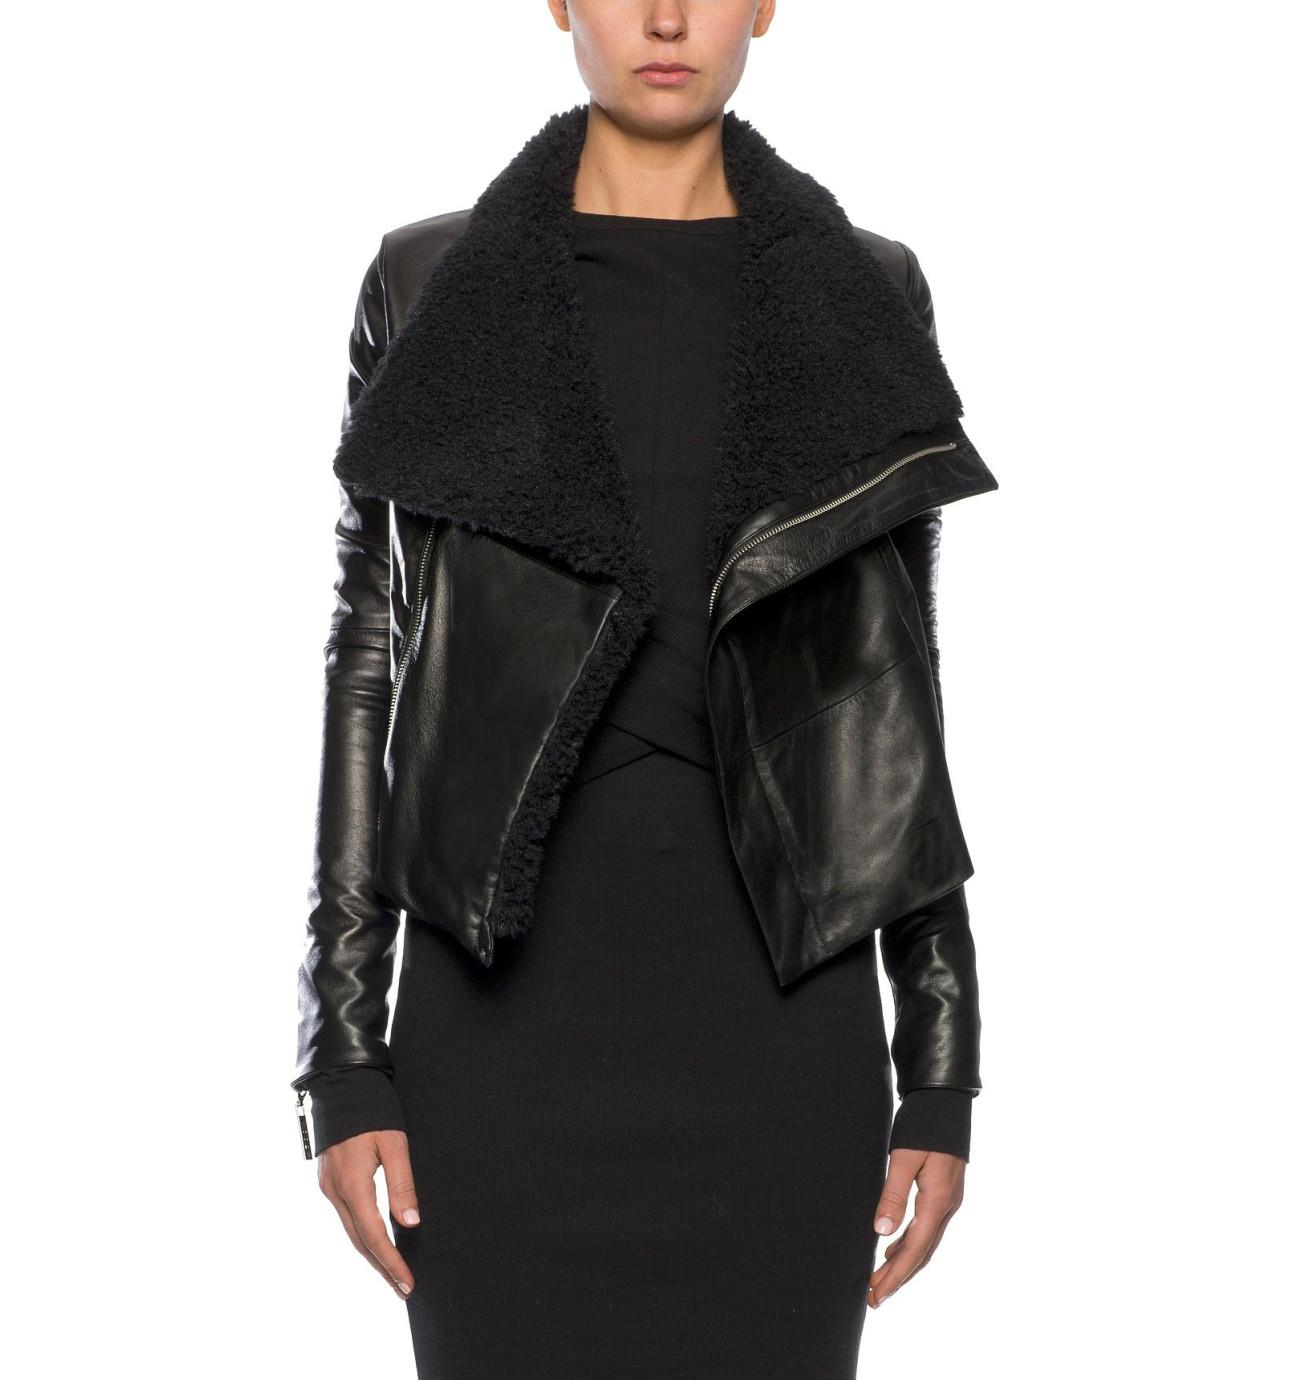 Mens jacket david jones - Mccartney Leather Jacket